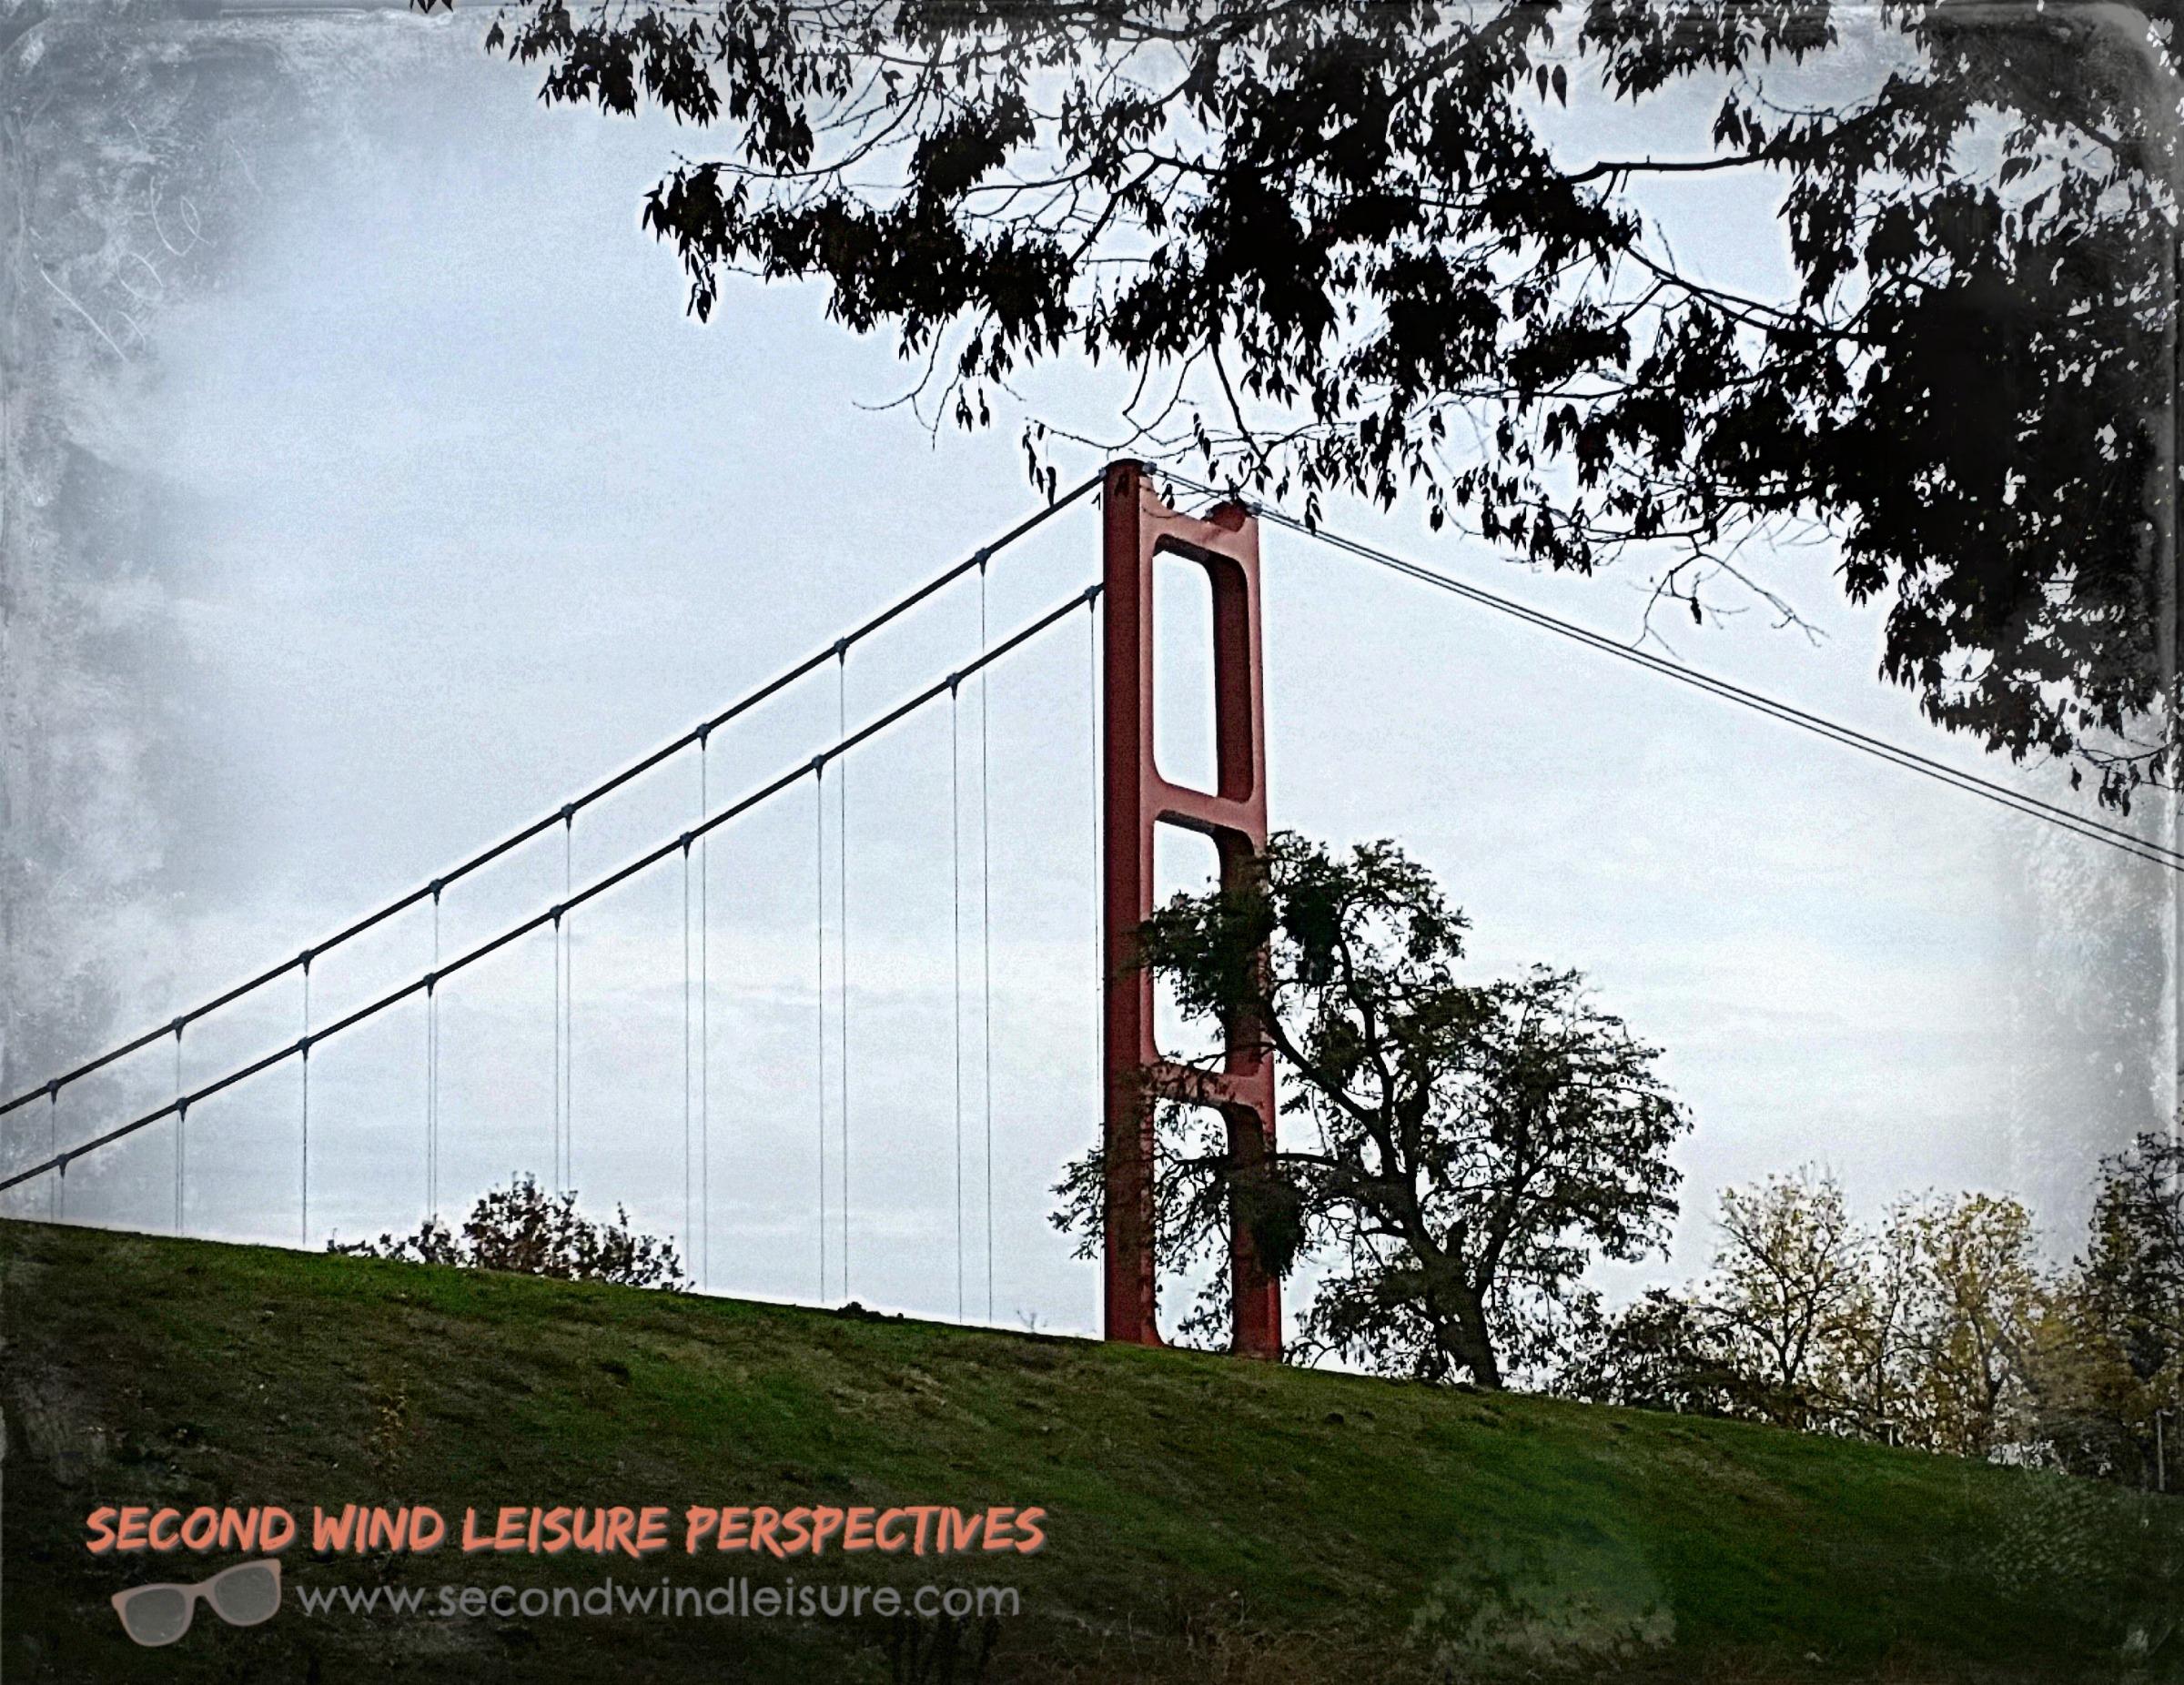 Sac State's Guy West Bridge